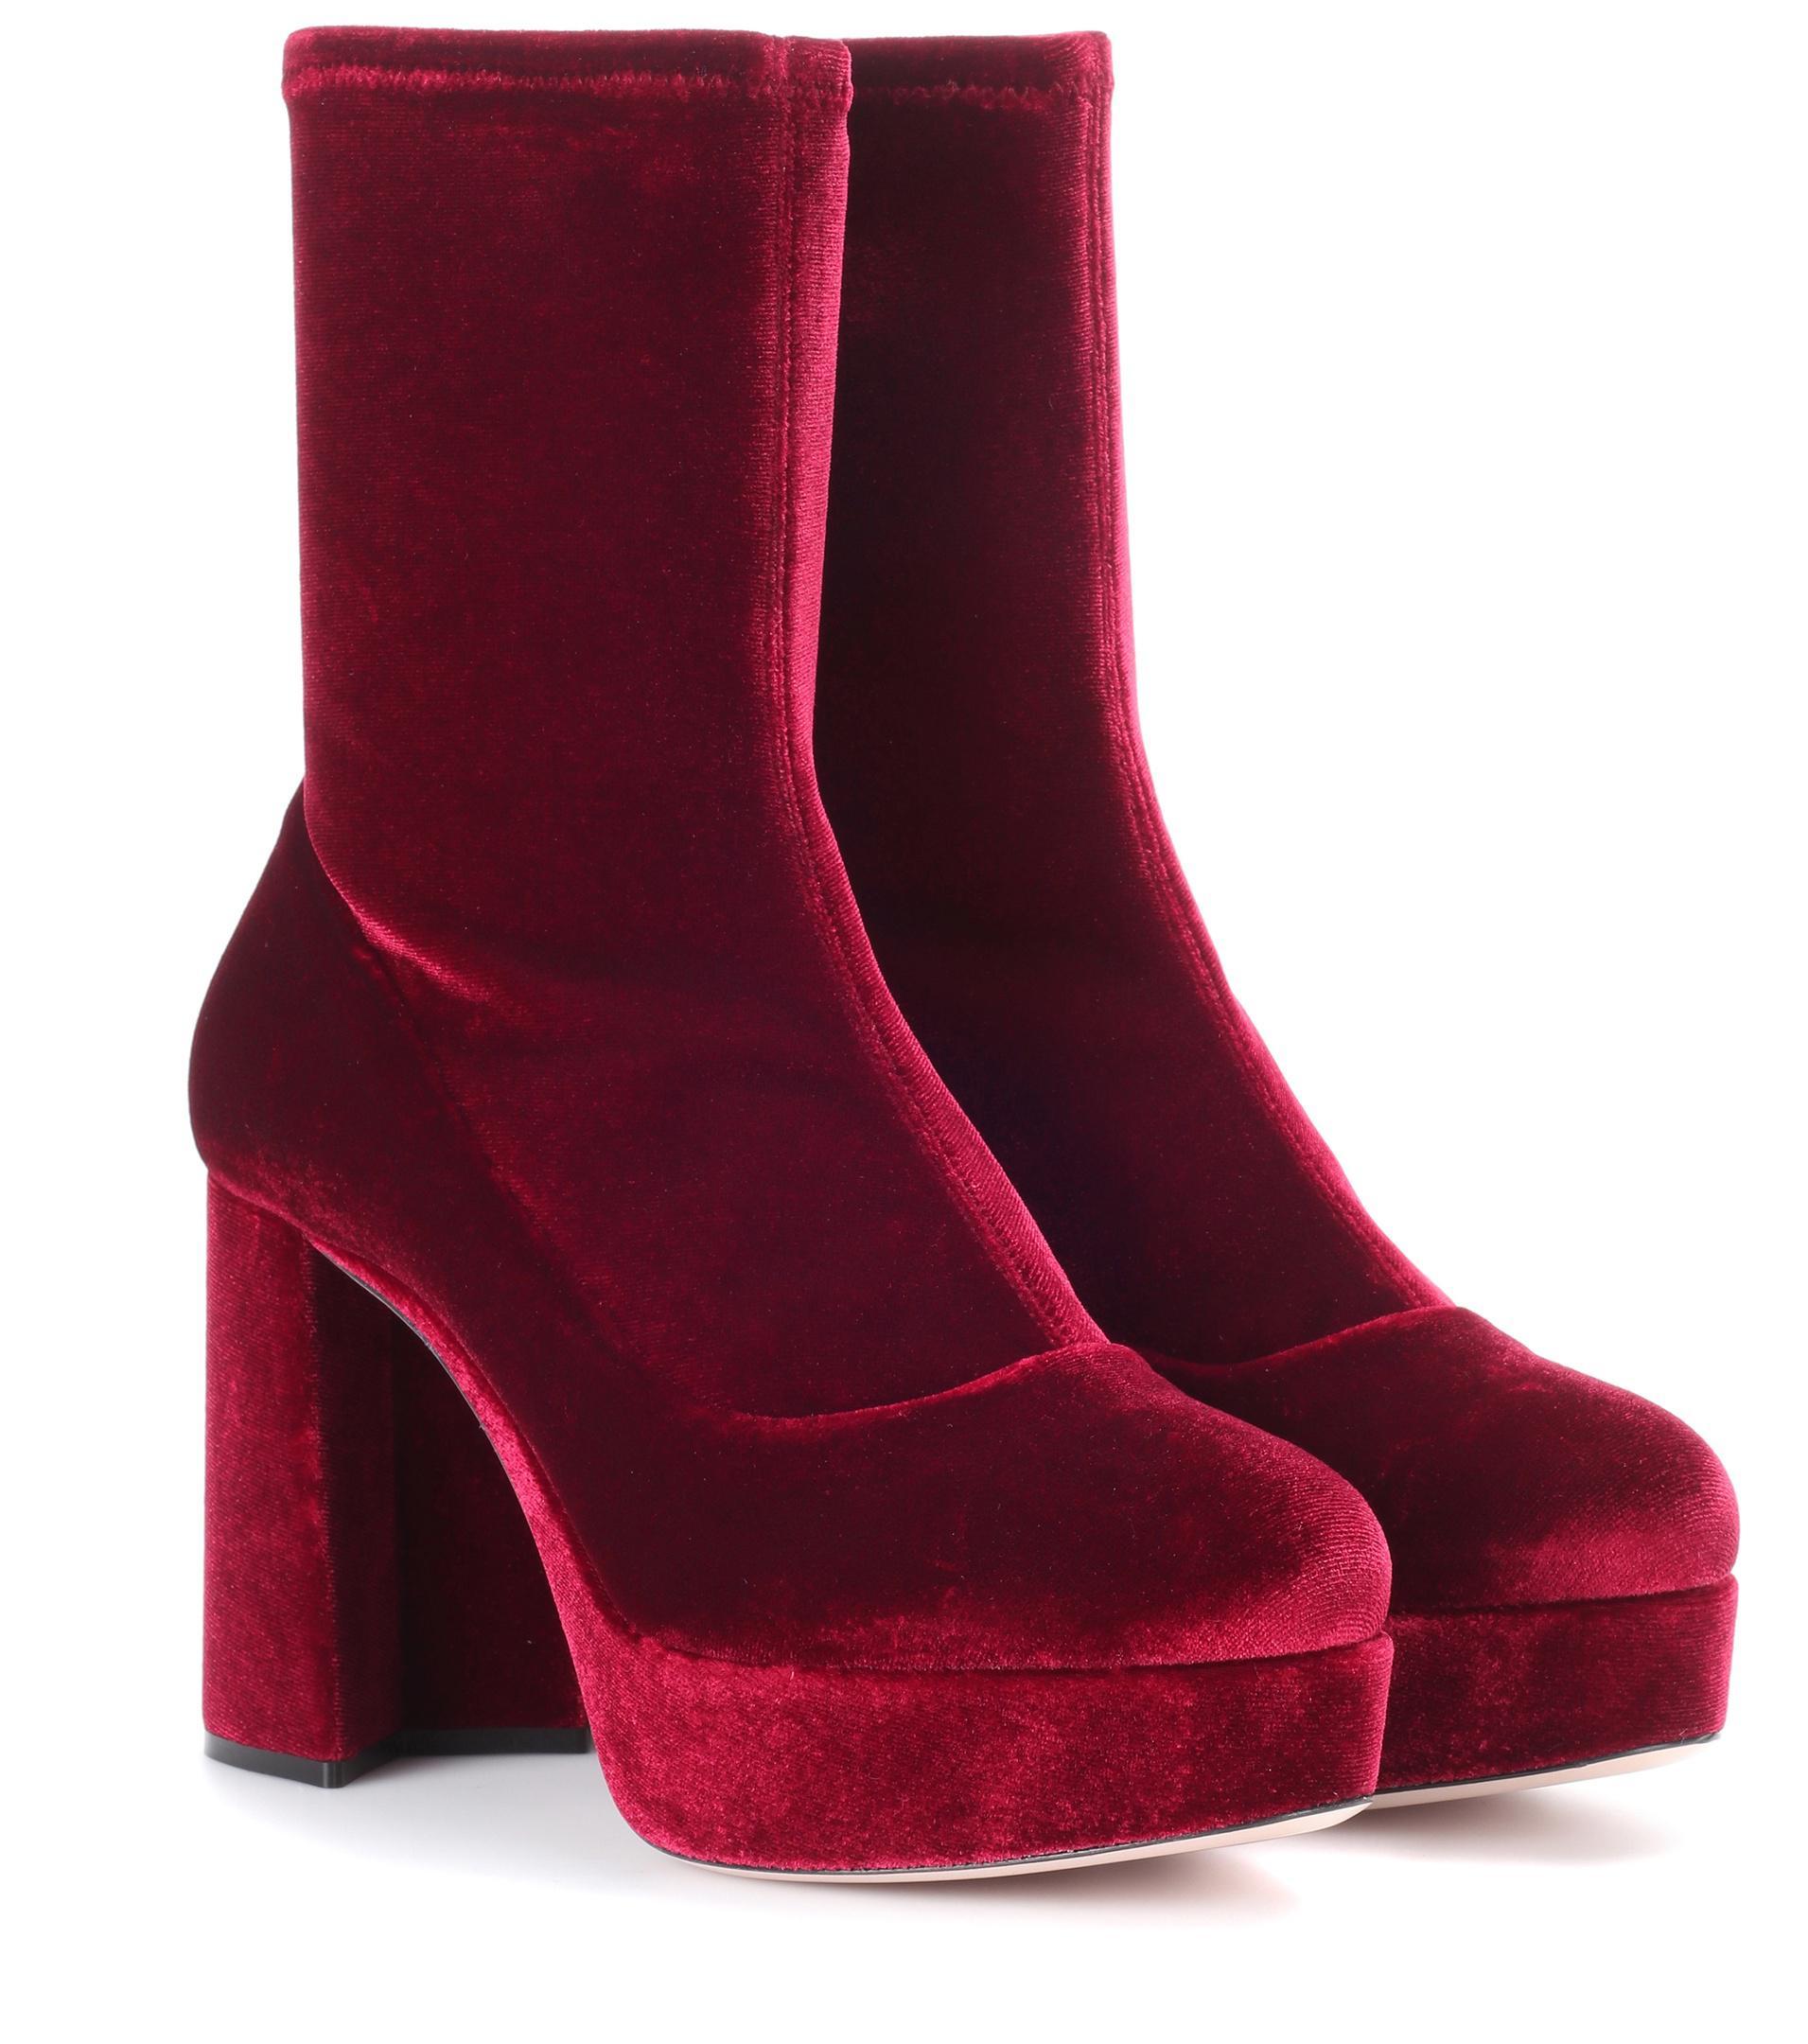 Miu Miu Velvet plateau ankle boots Ebay Cheap Online m0Zwoa